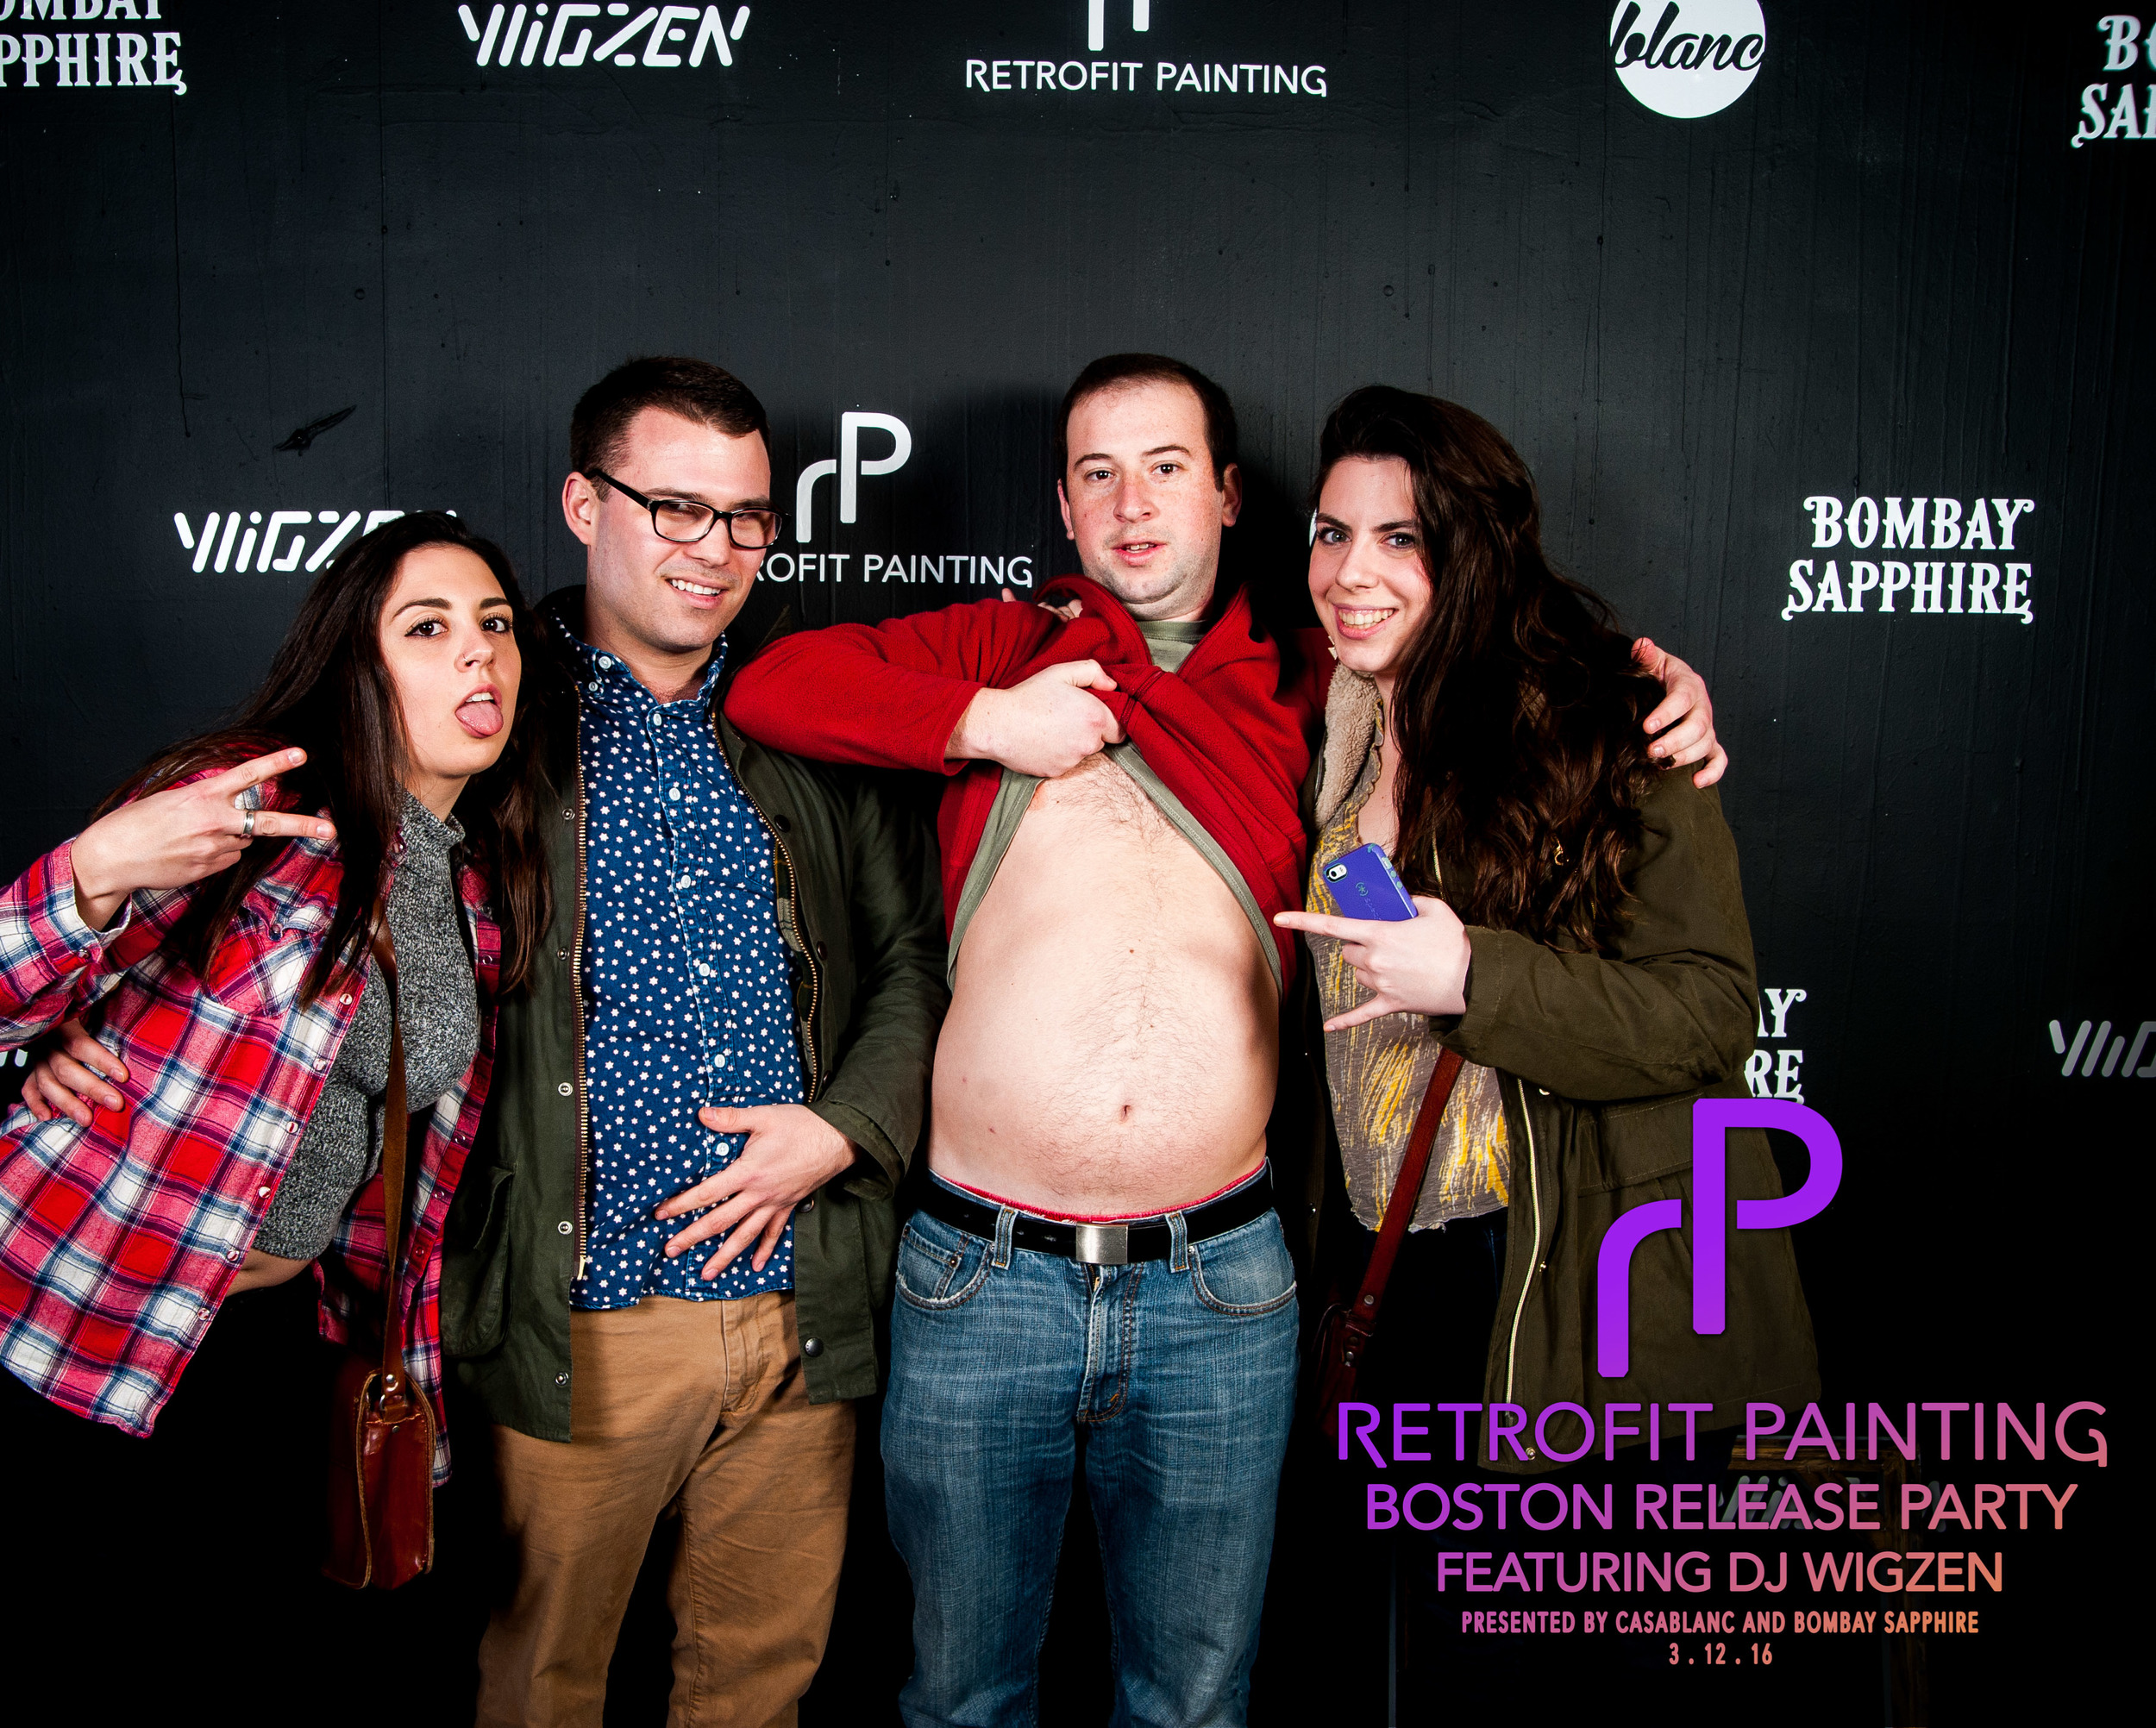 Retrofit Painting Boston Release Party 027.jpg